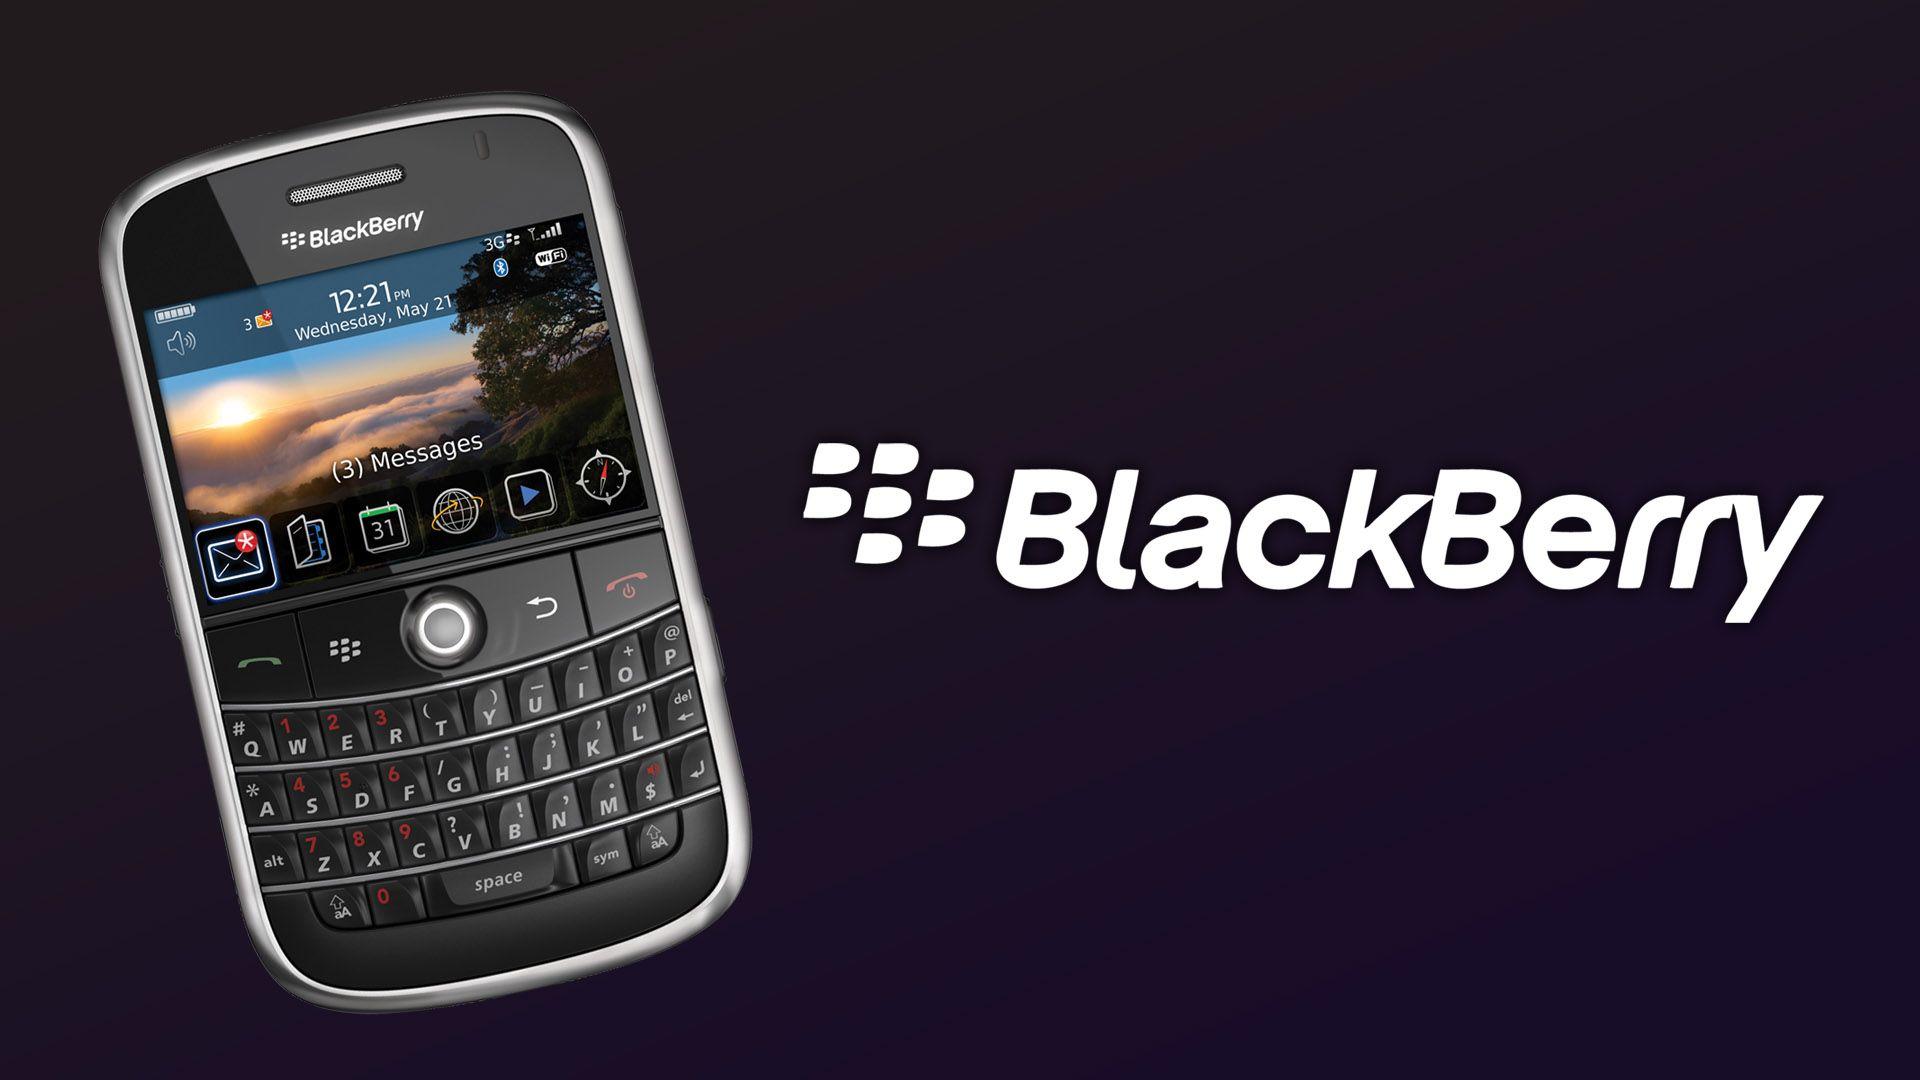 porn-app-for-blackberry-prepubescent-website